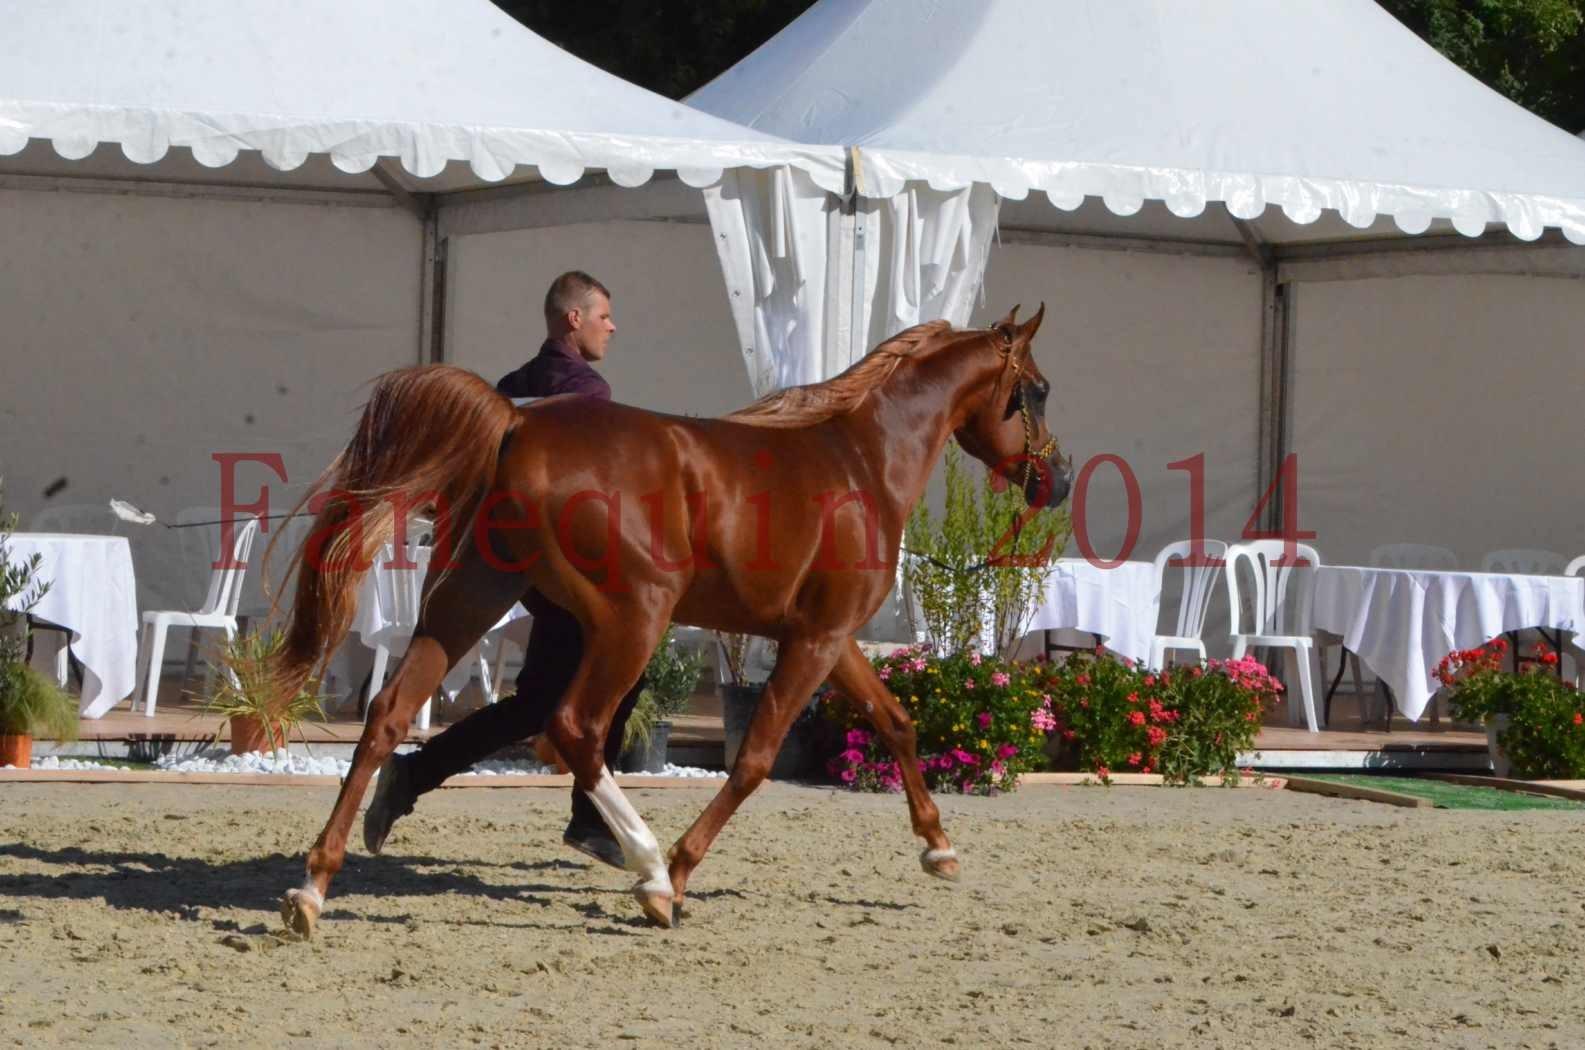 Championnat de FRANCE 2014 - Amateurs - SELECTO IBN SAMAWI - 051